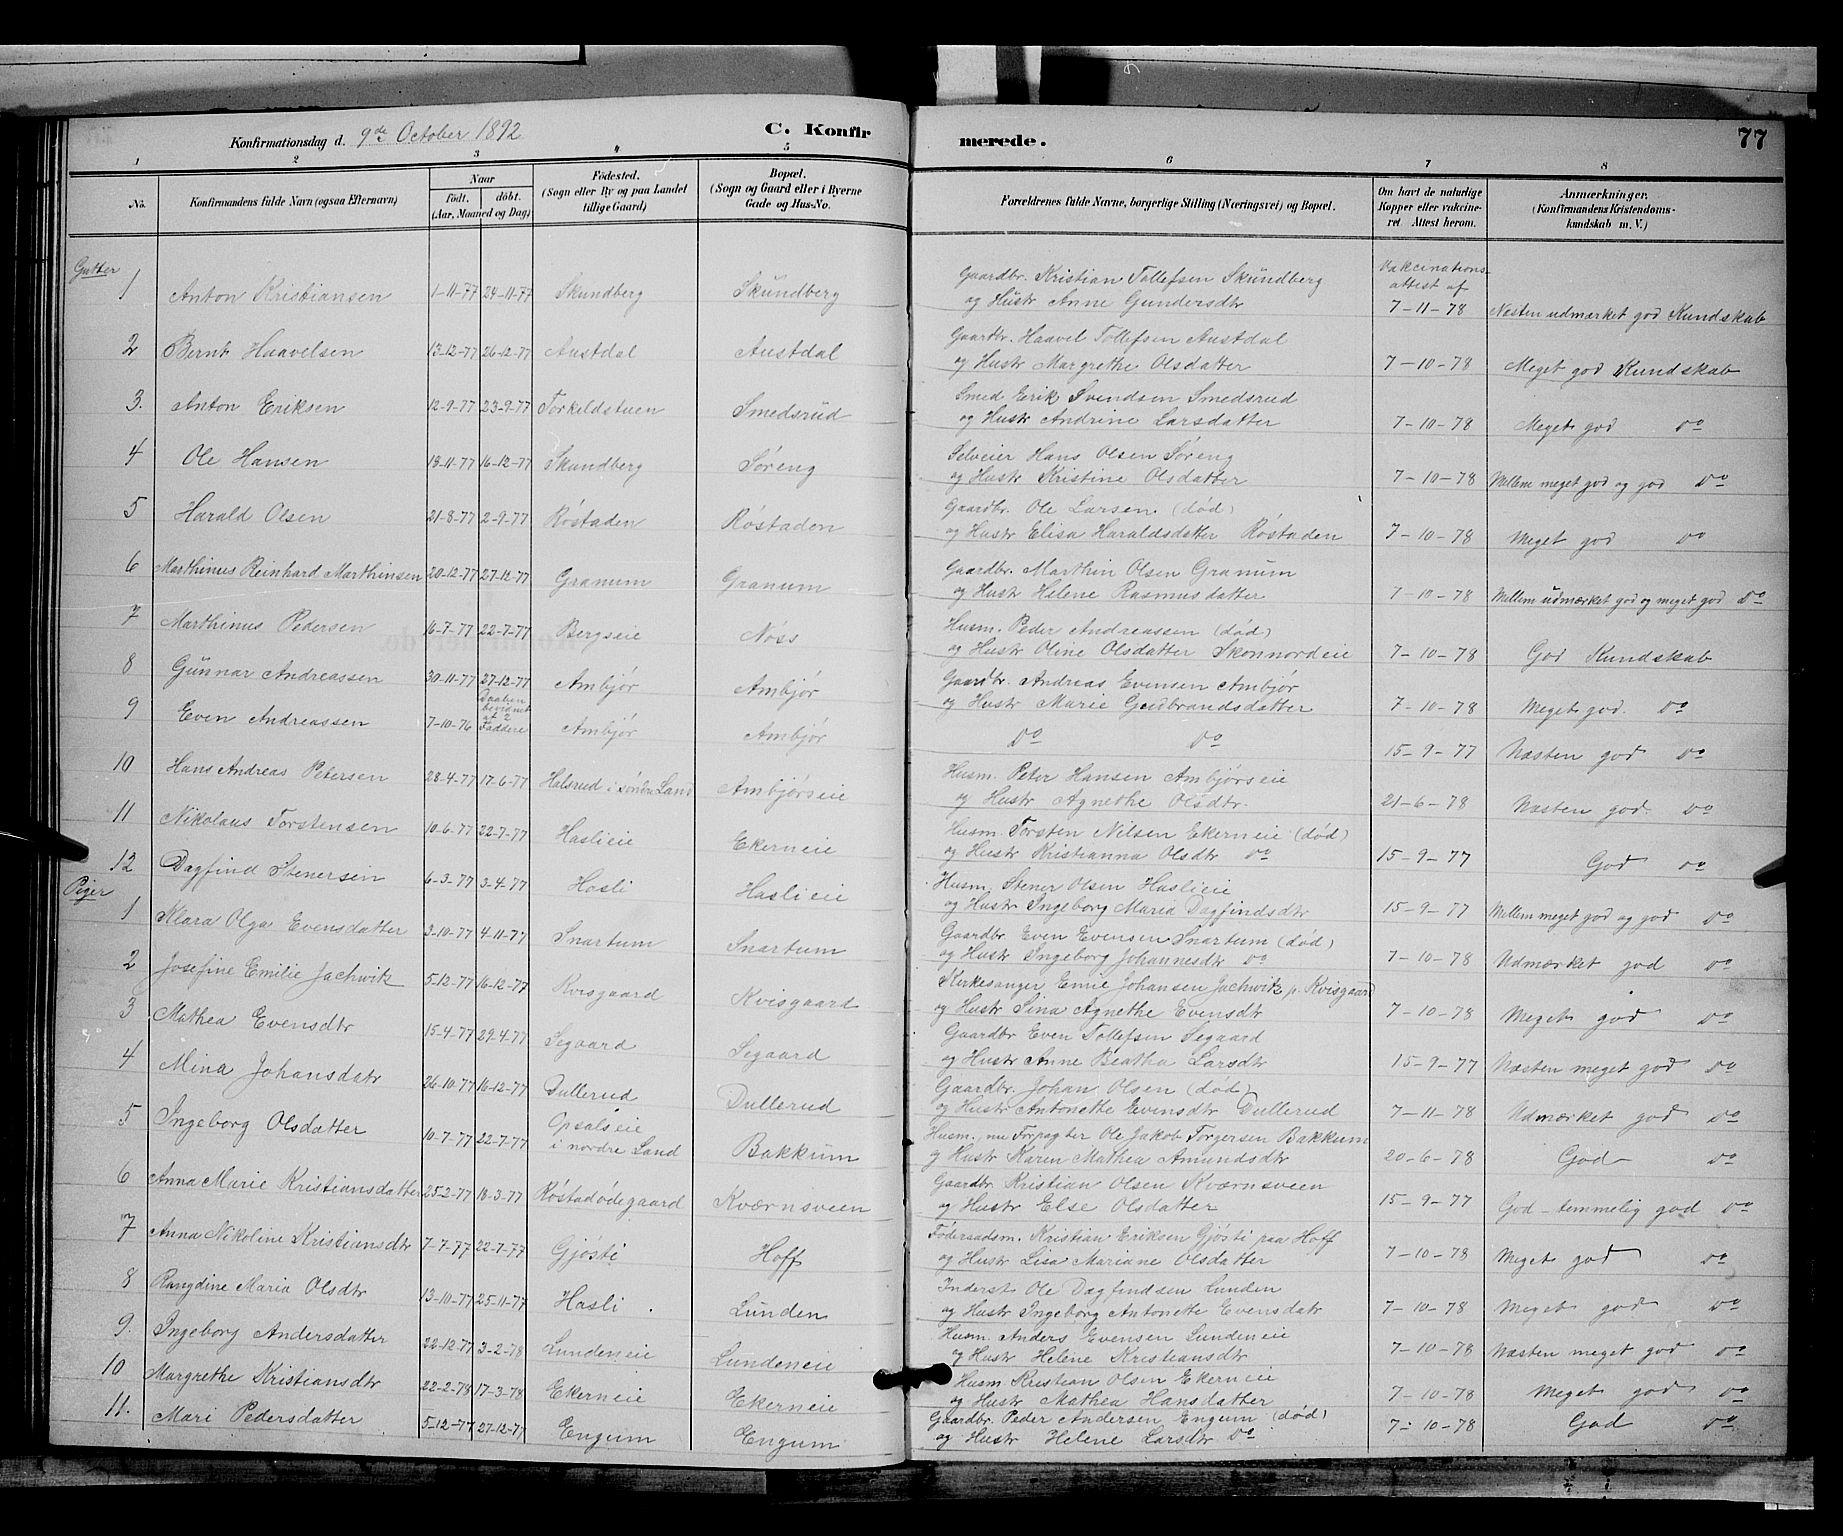 SAH, Biri prestekontor, Klokkerbok nr. 3, 1892-1905, s. 77